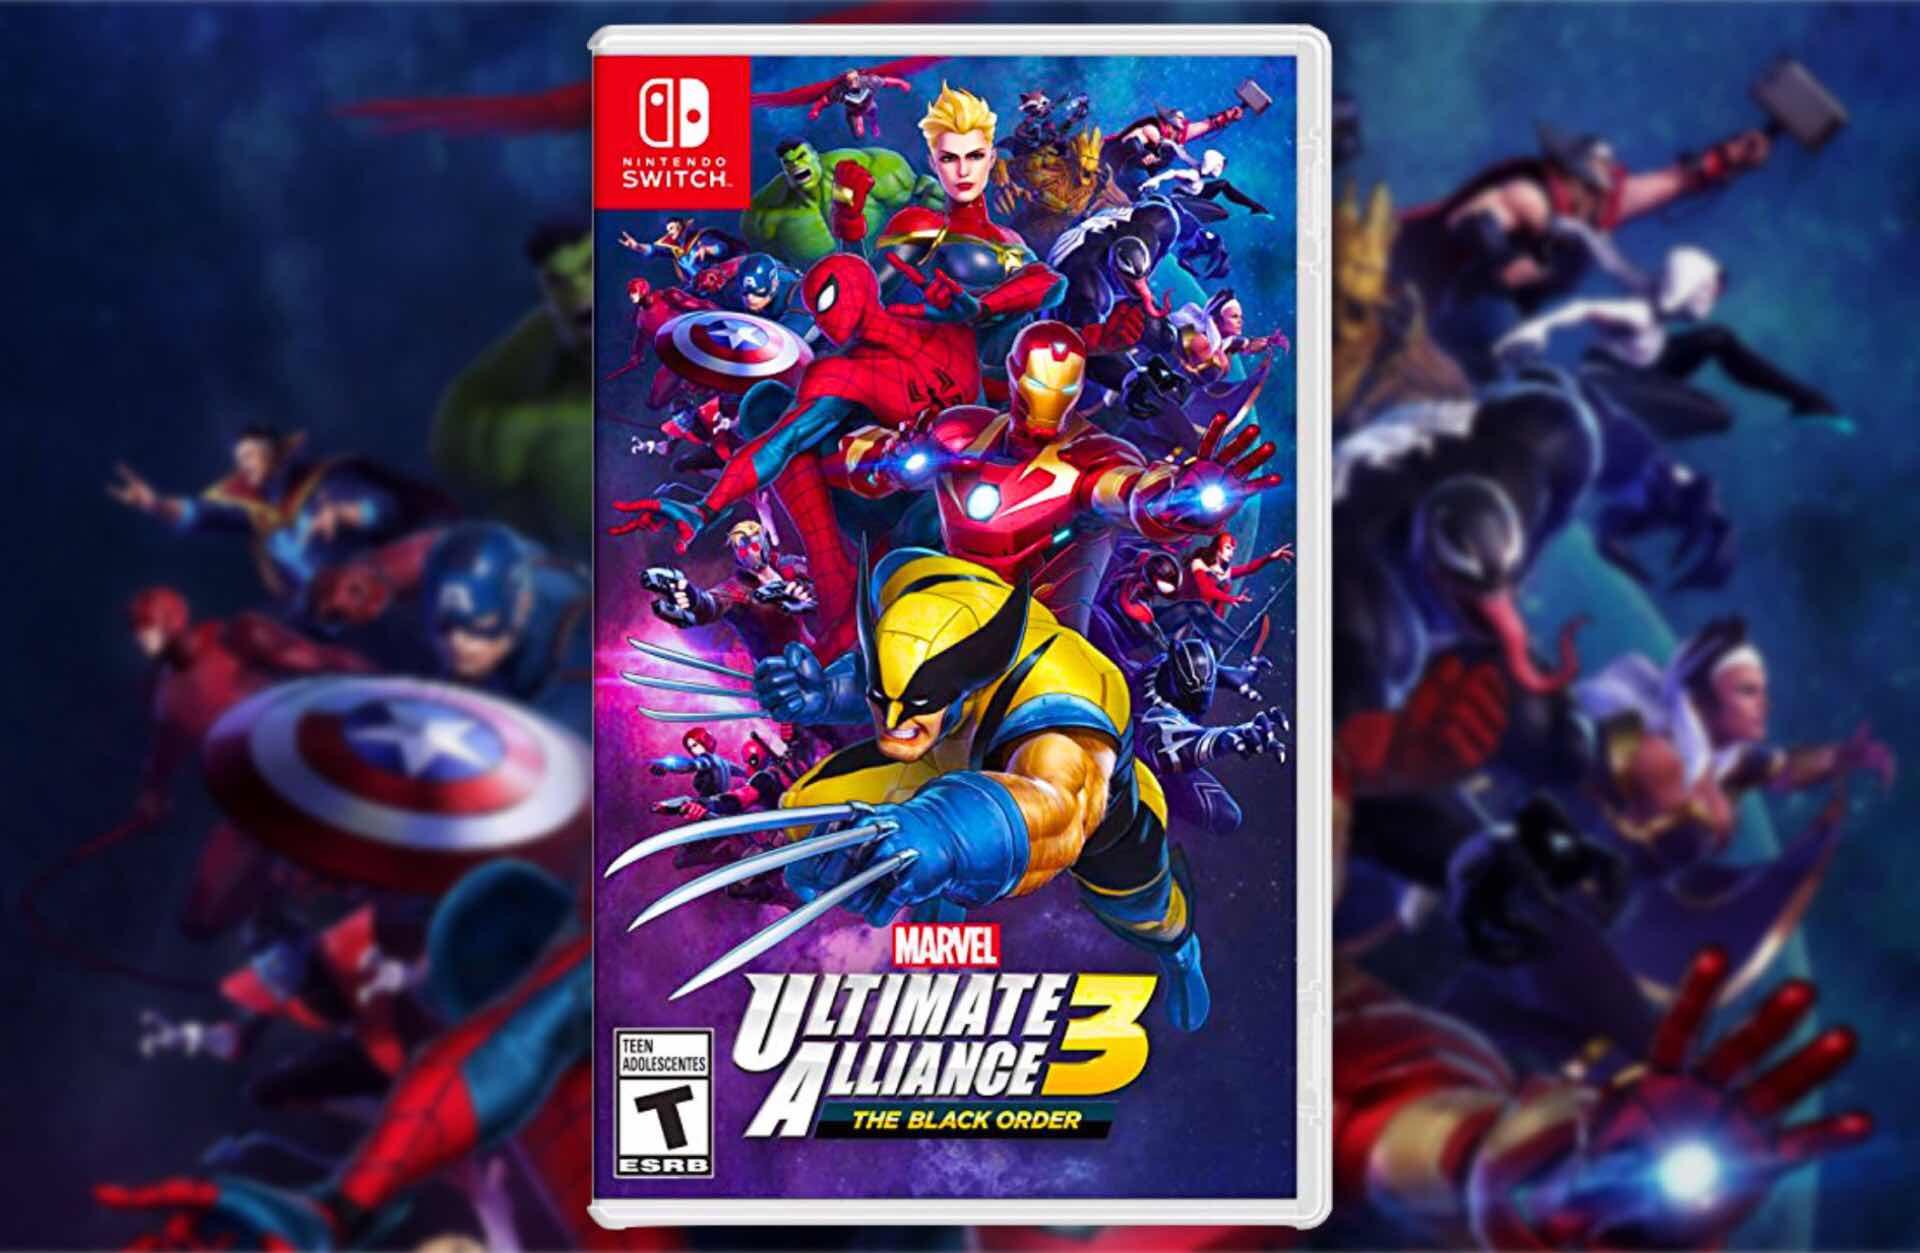 marvel-ultimate-alliance-3-the-black-order-for-nintendo-switch